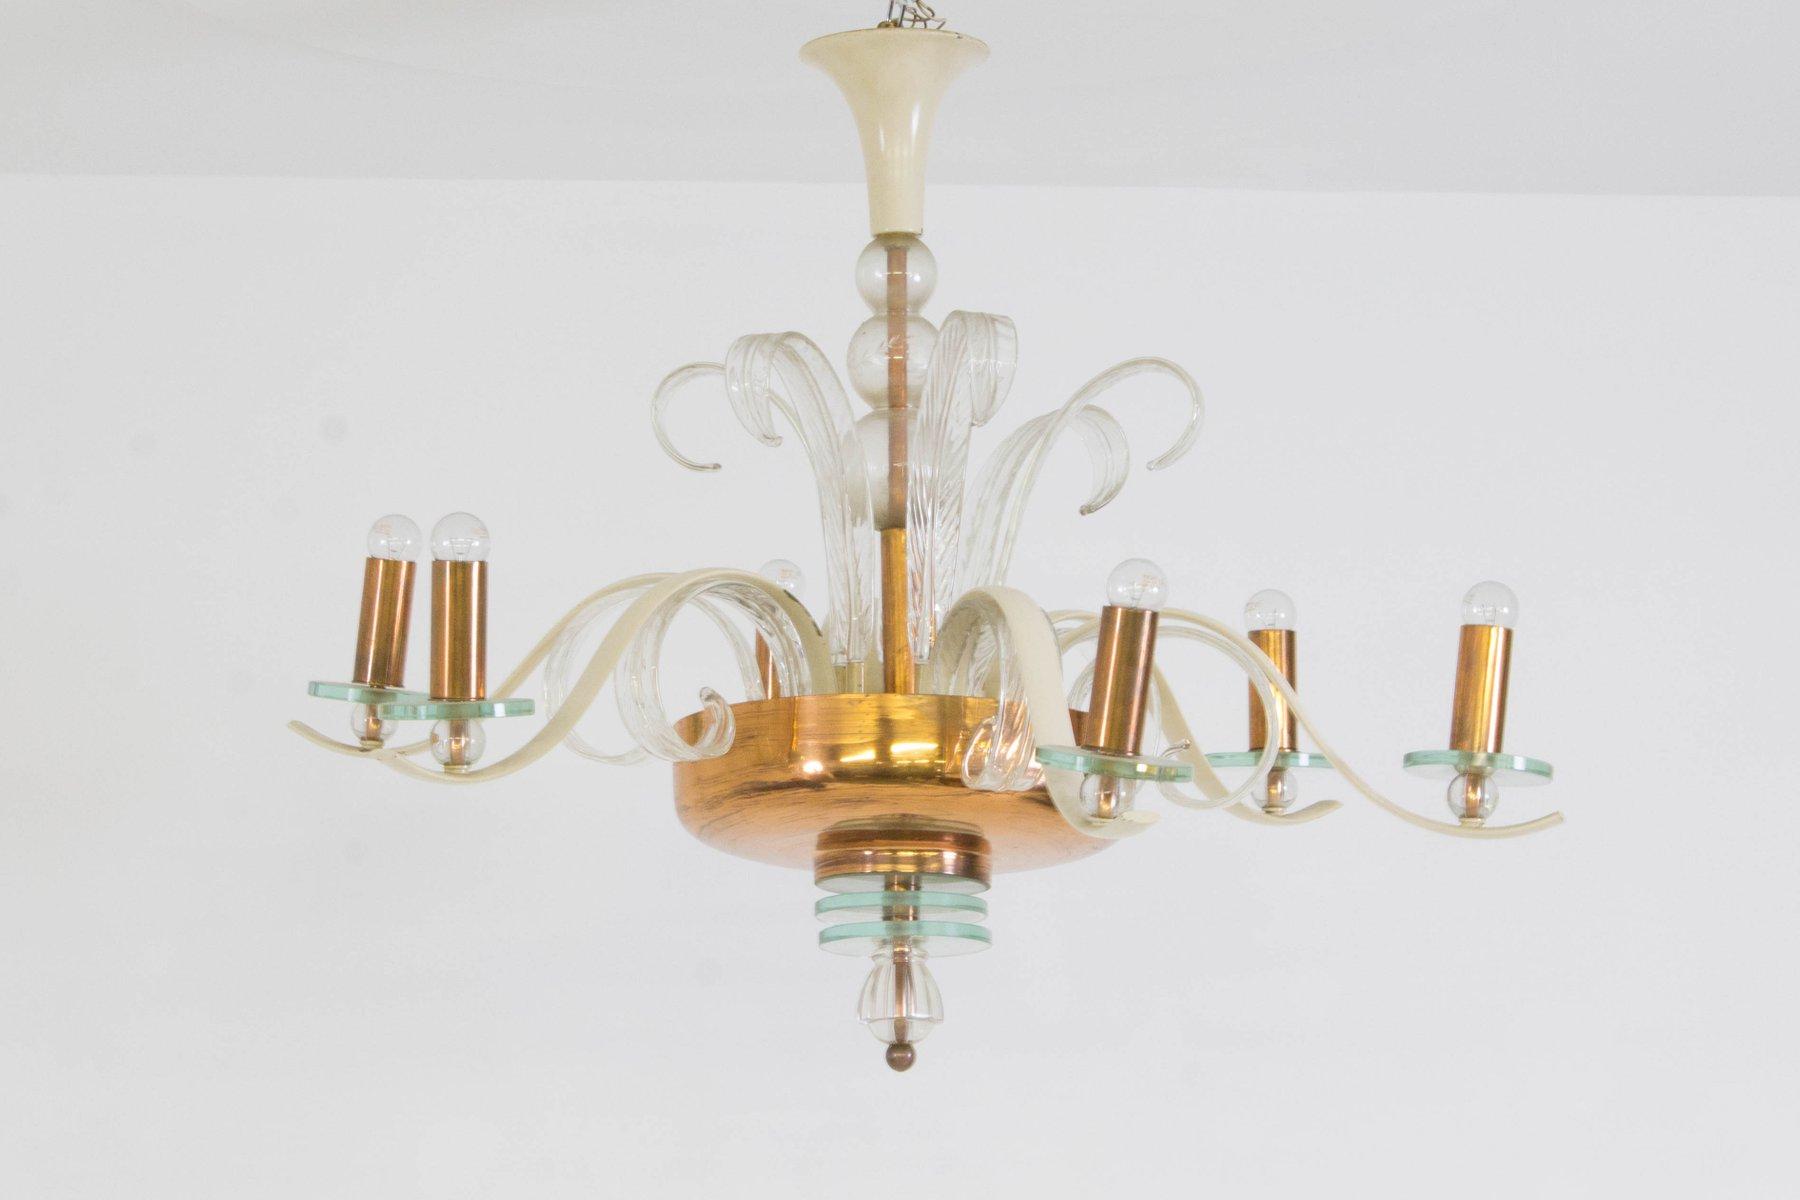 lustre en verre murano italie 1940s en vente sur pamono. Black Bedroom Furniture Sets. Home Design Ideas